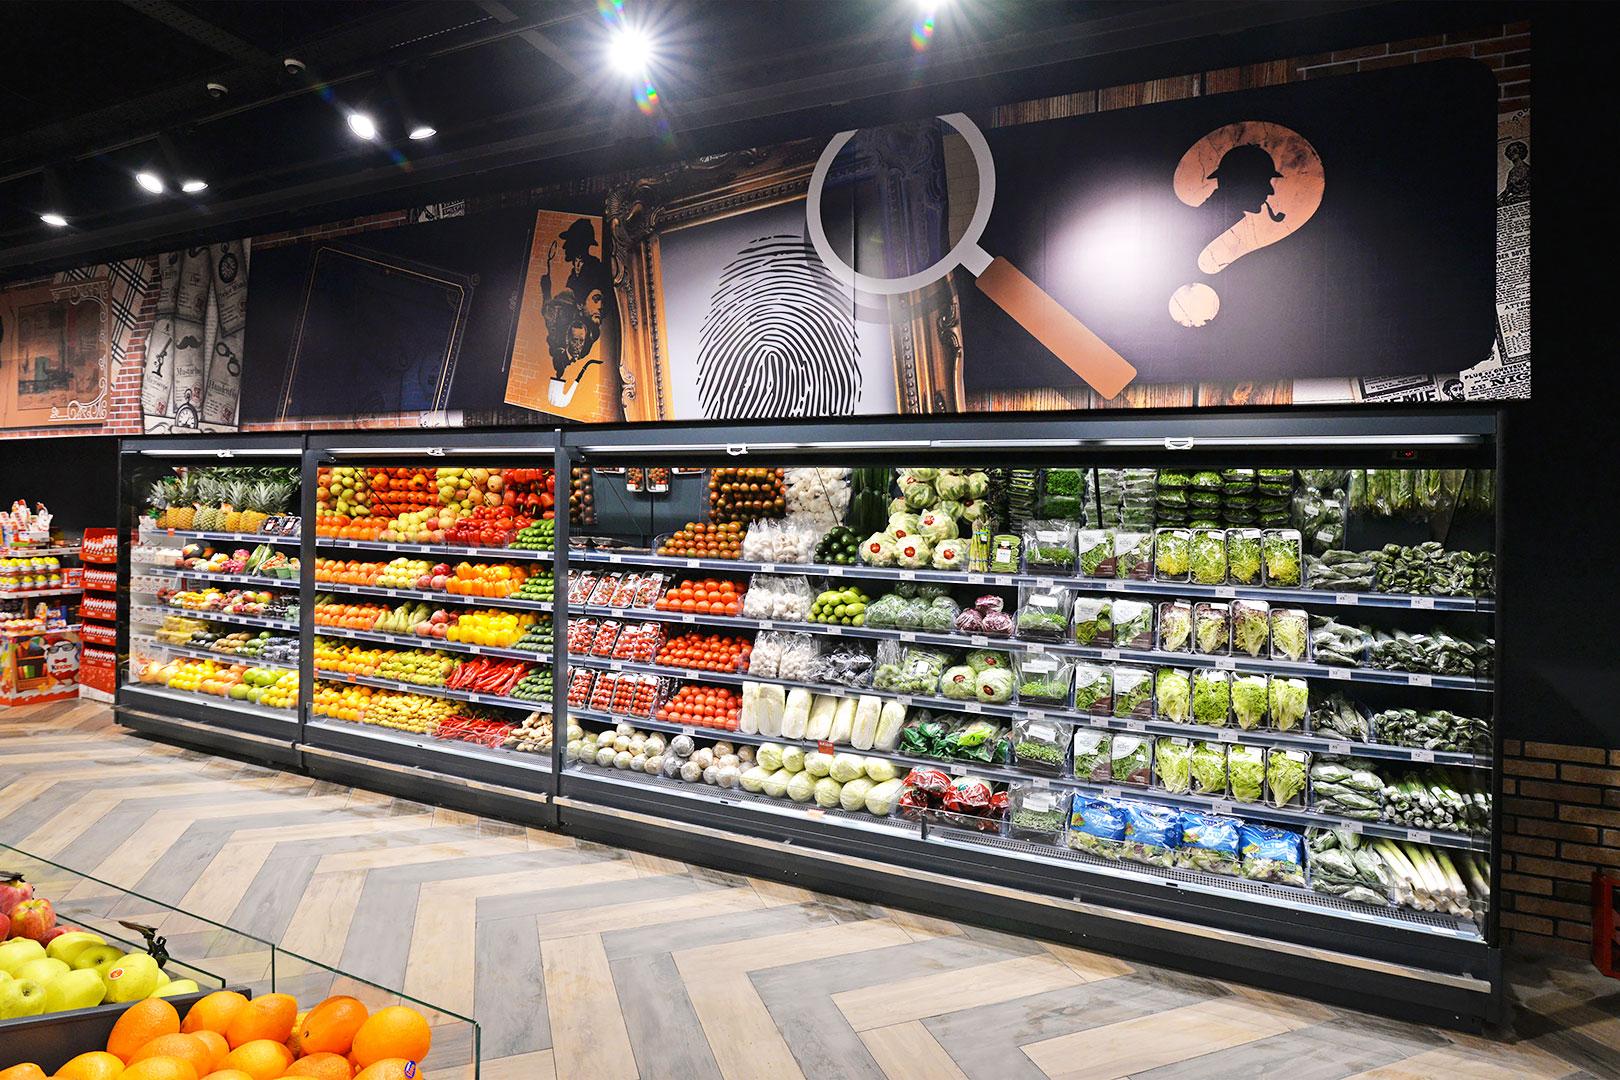 Specialized units for vegetables and fruit sales Indiana MV 080 FV O 205-DLM